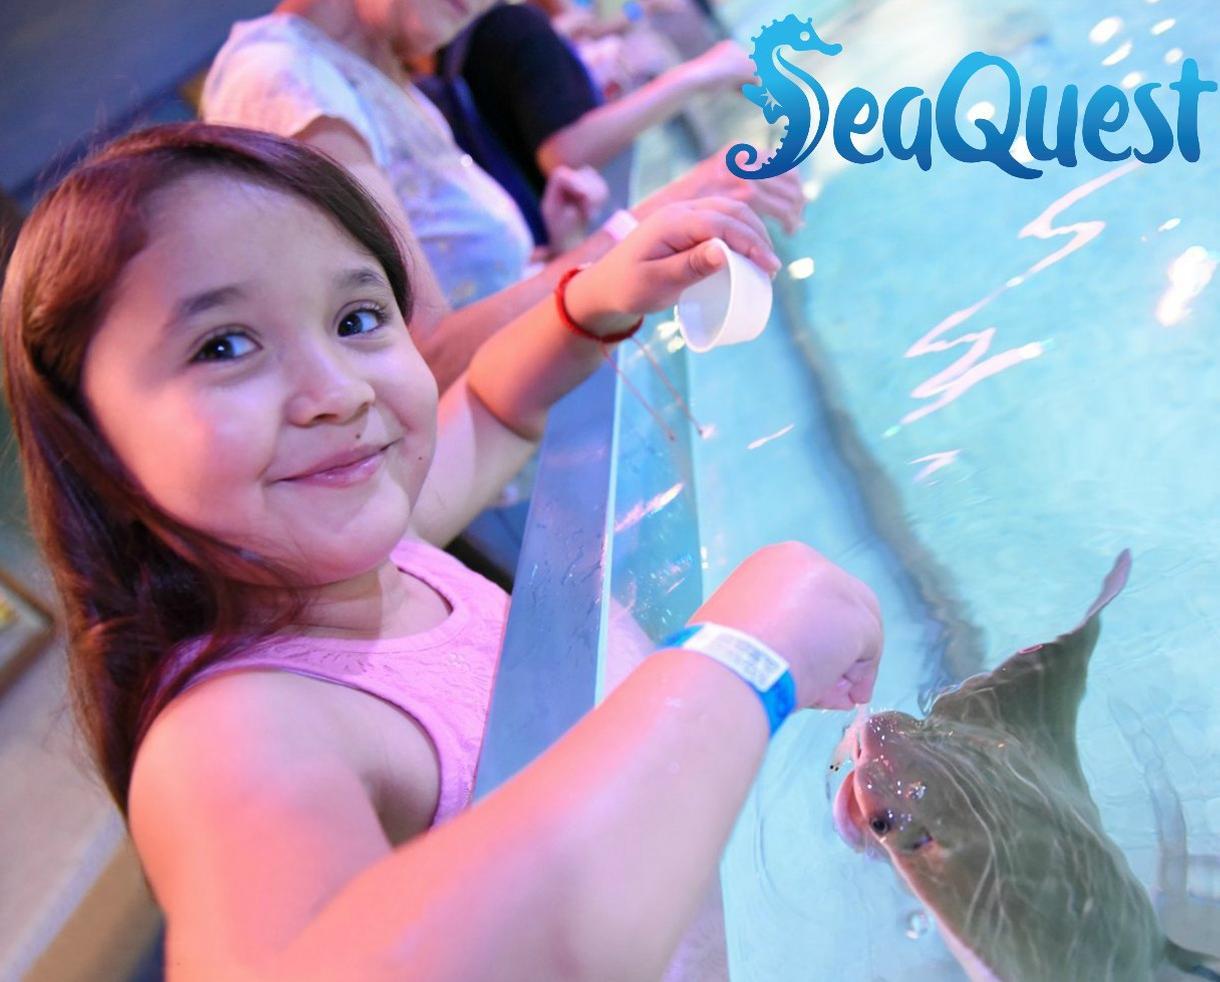 SeaQuest Annual Passport + 6 Feeding Tokens